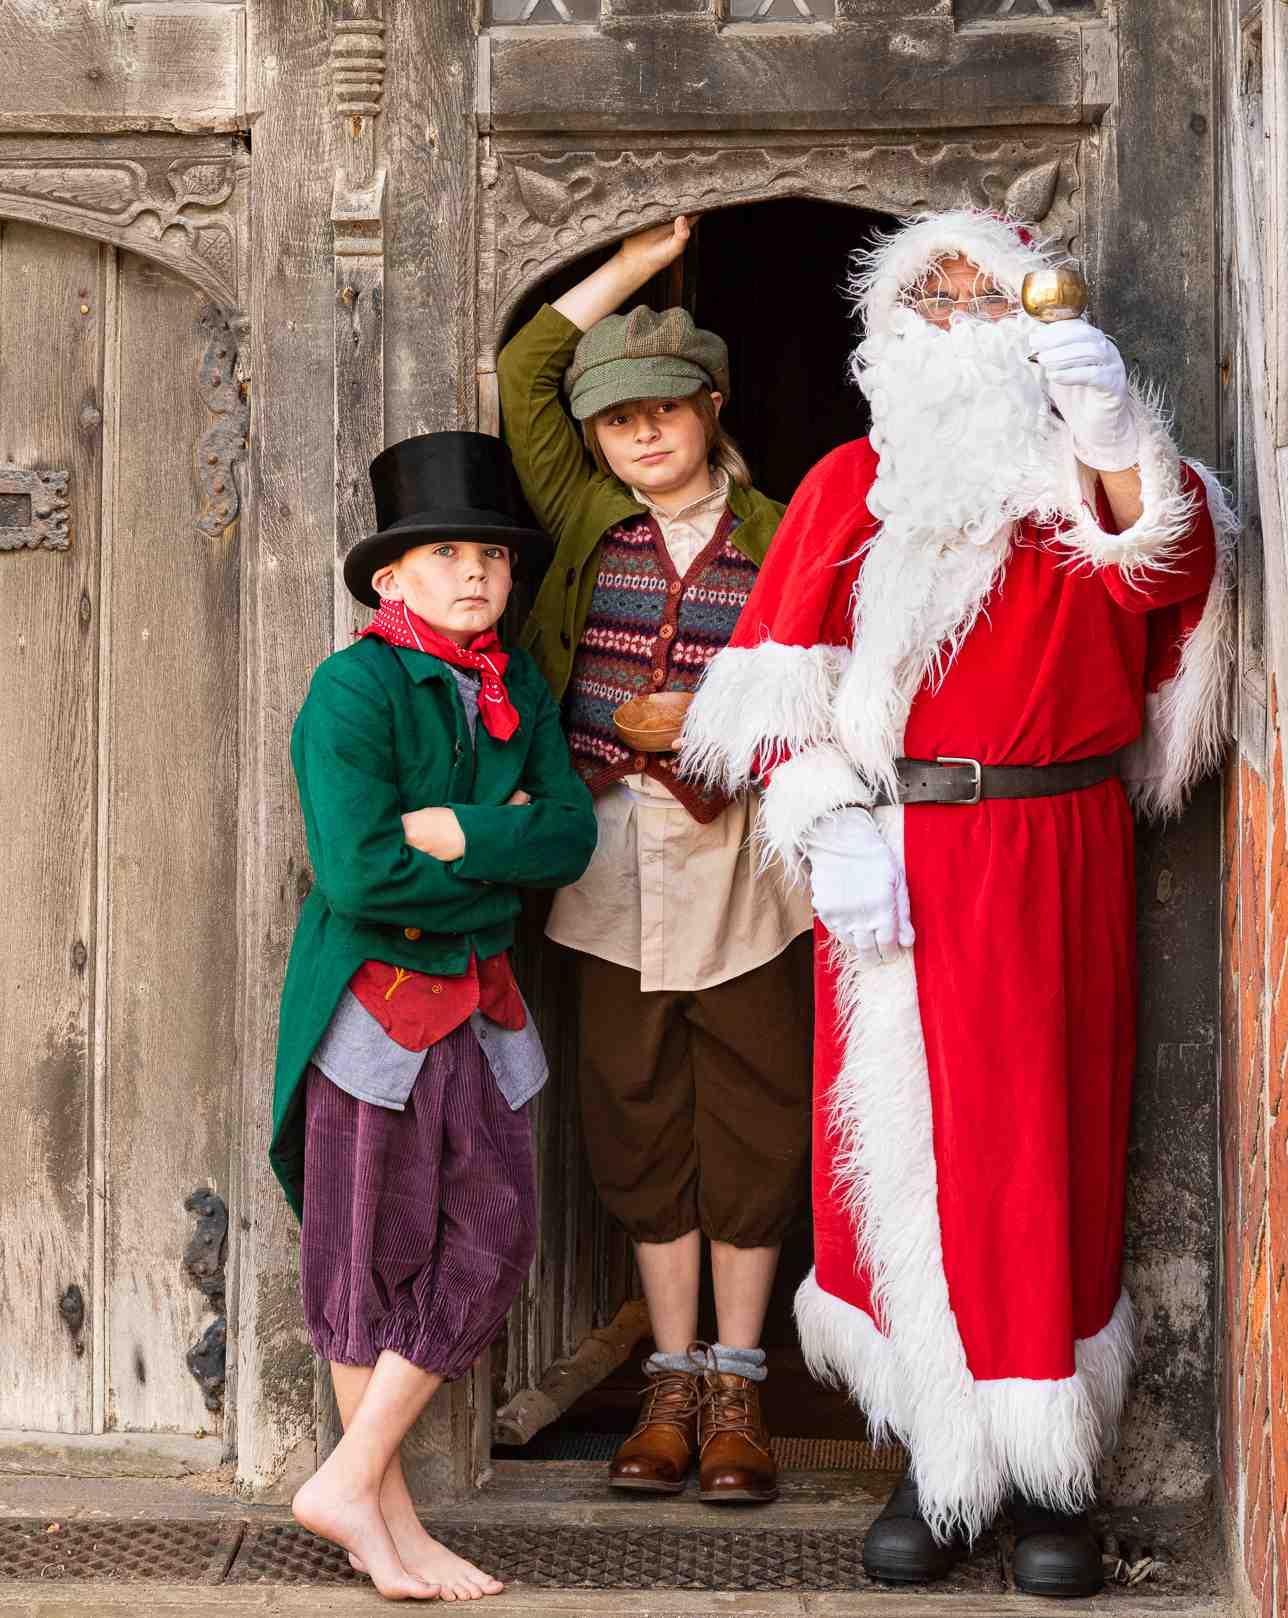 ALDEBURGH DICKENSIAN CHRISTMAS